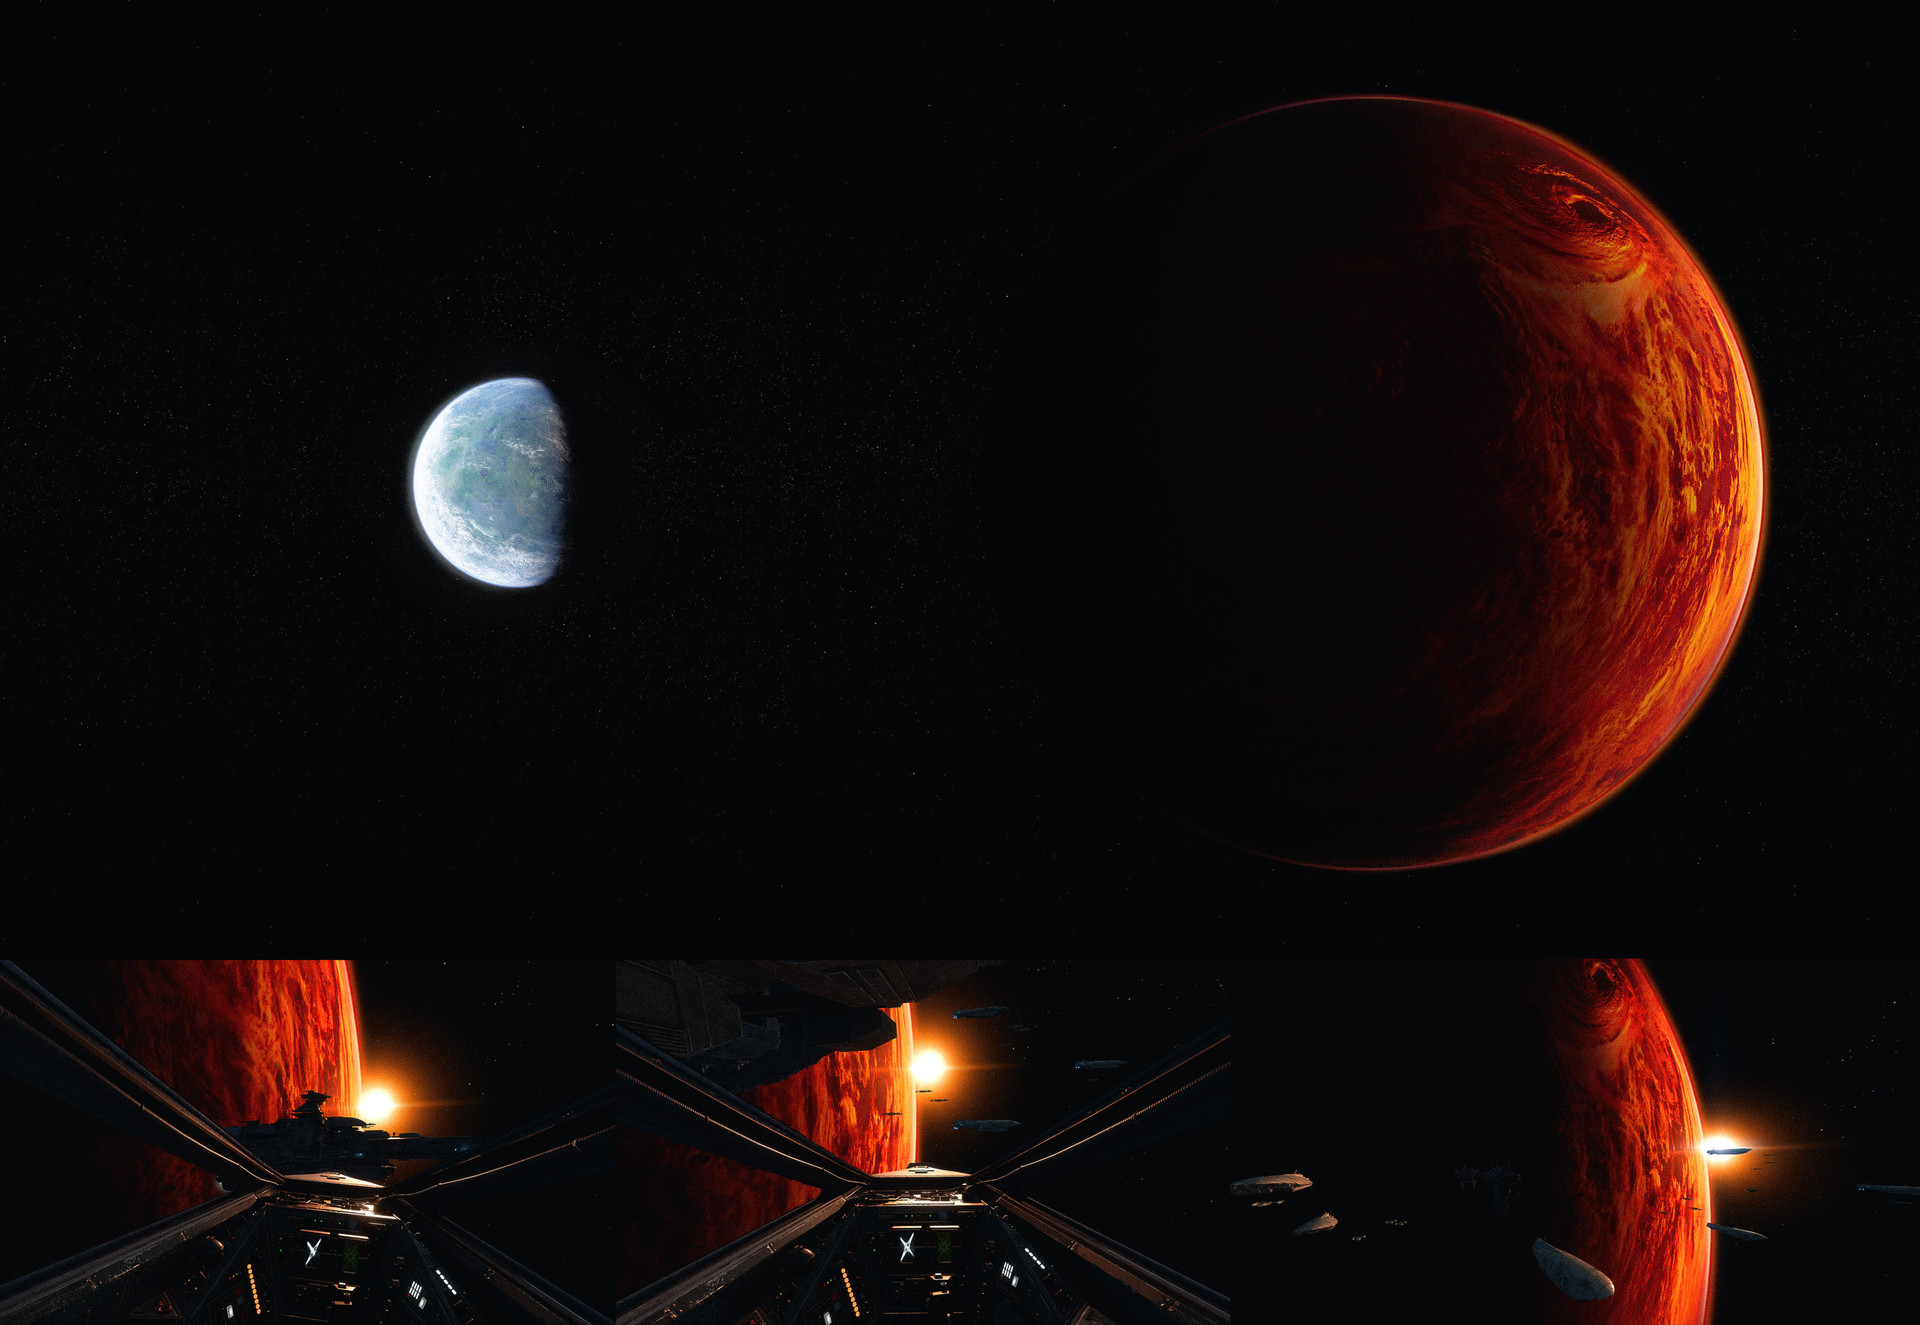 Darius kalinauskas starwars yavin background dice